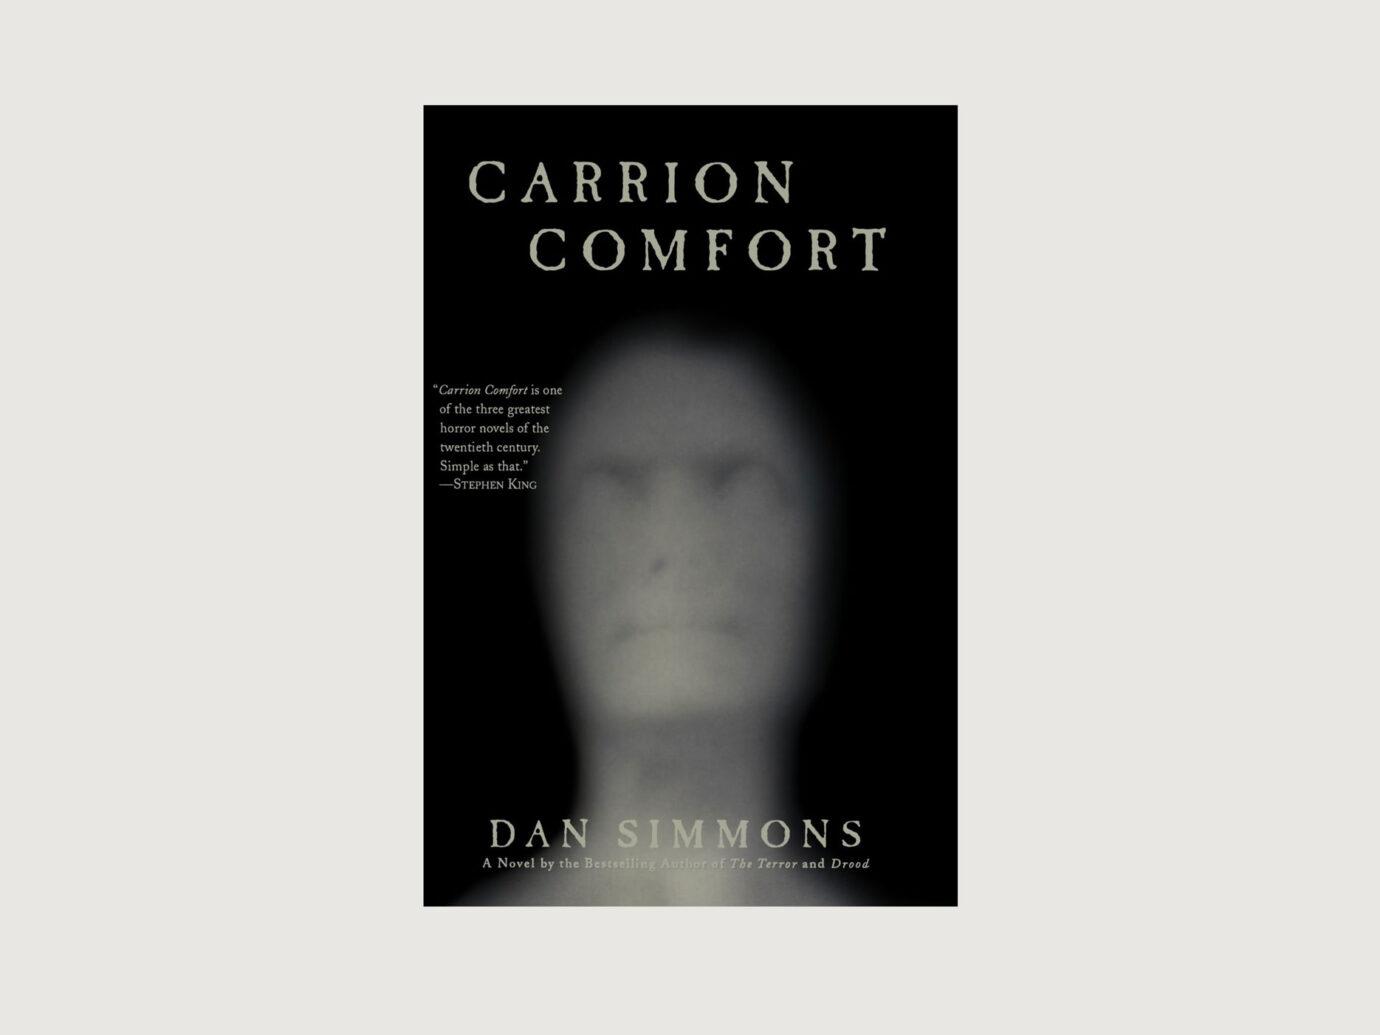 Carrion Comfort: A Novel by Dan Simmons